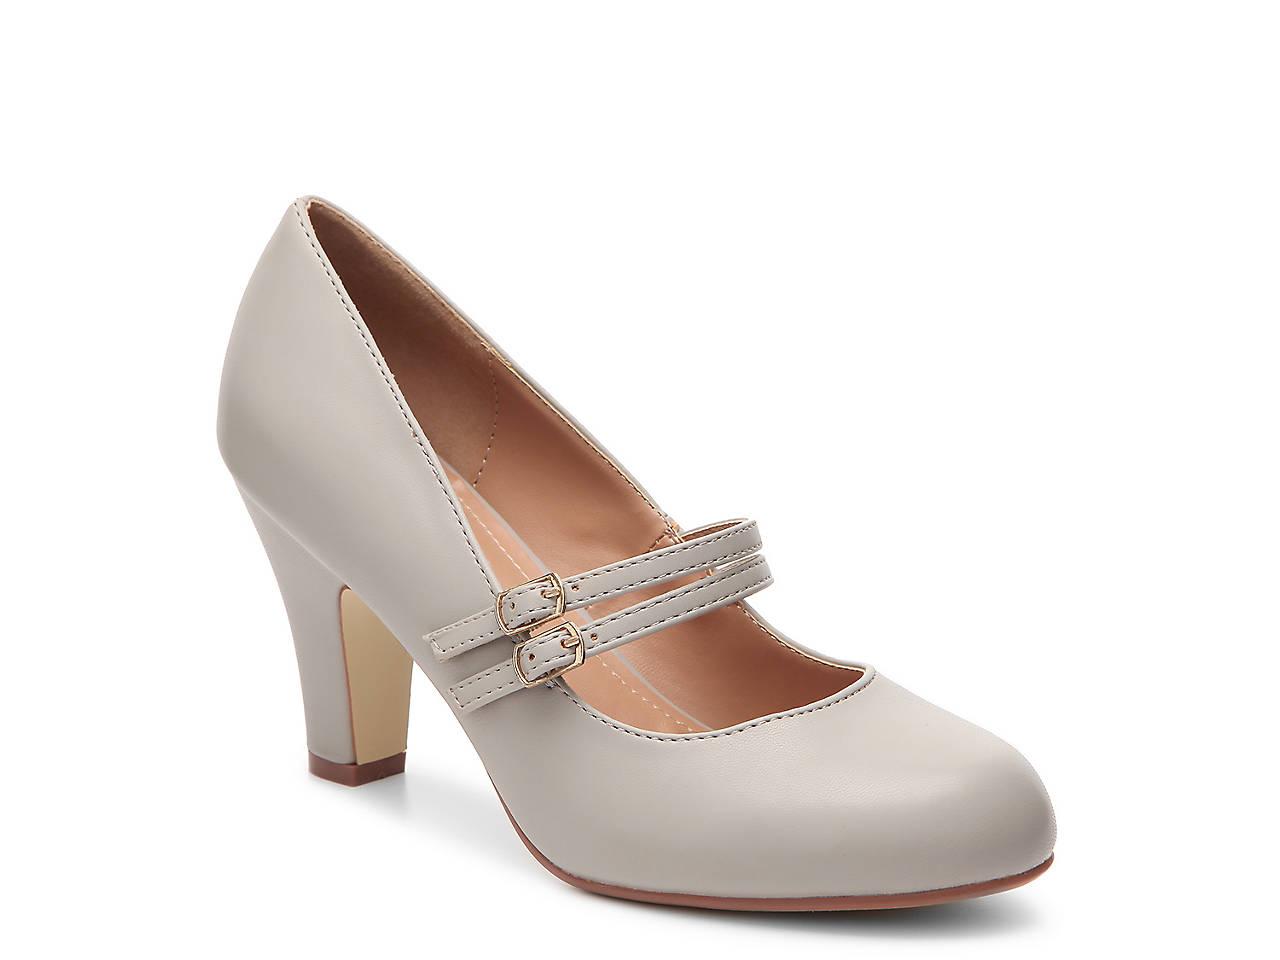 poshmark comforter shoes leather croc listing m black mary comfortable drew jane comfort